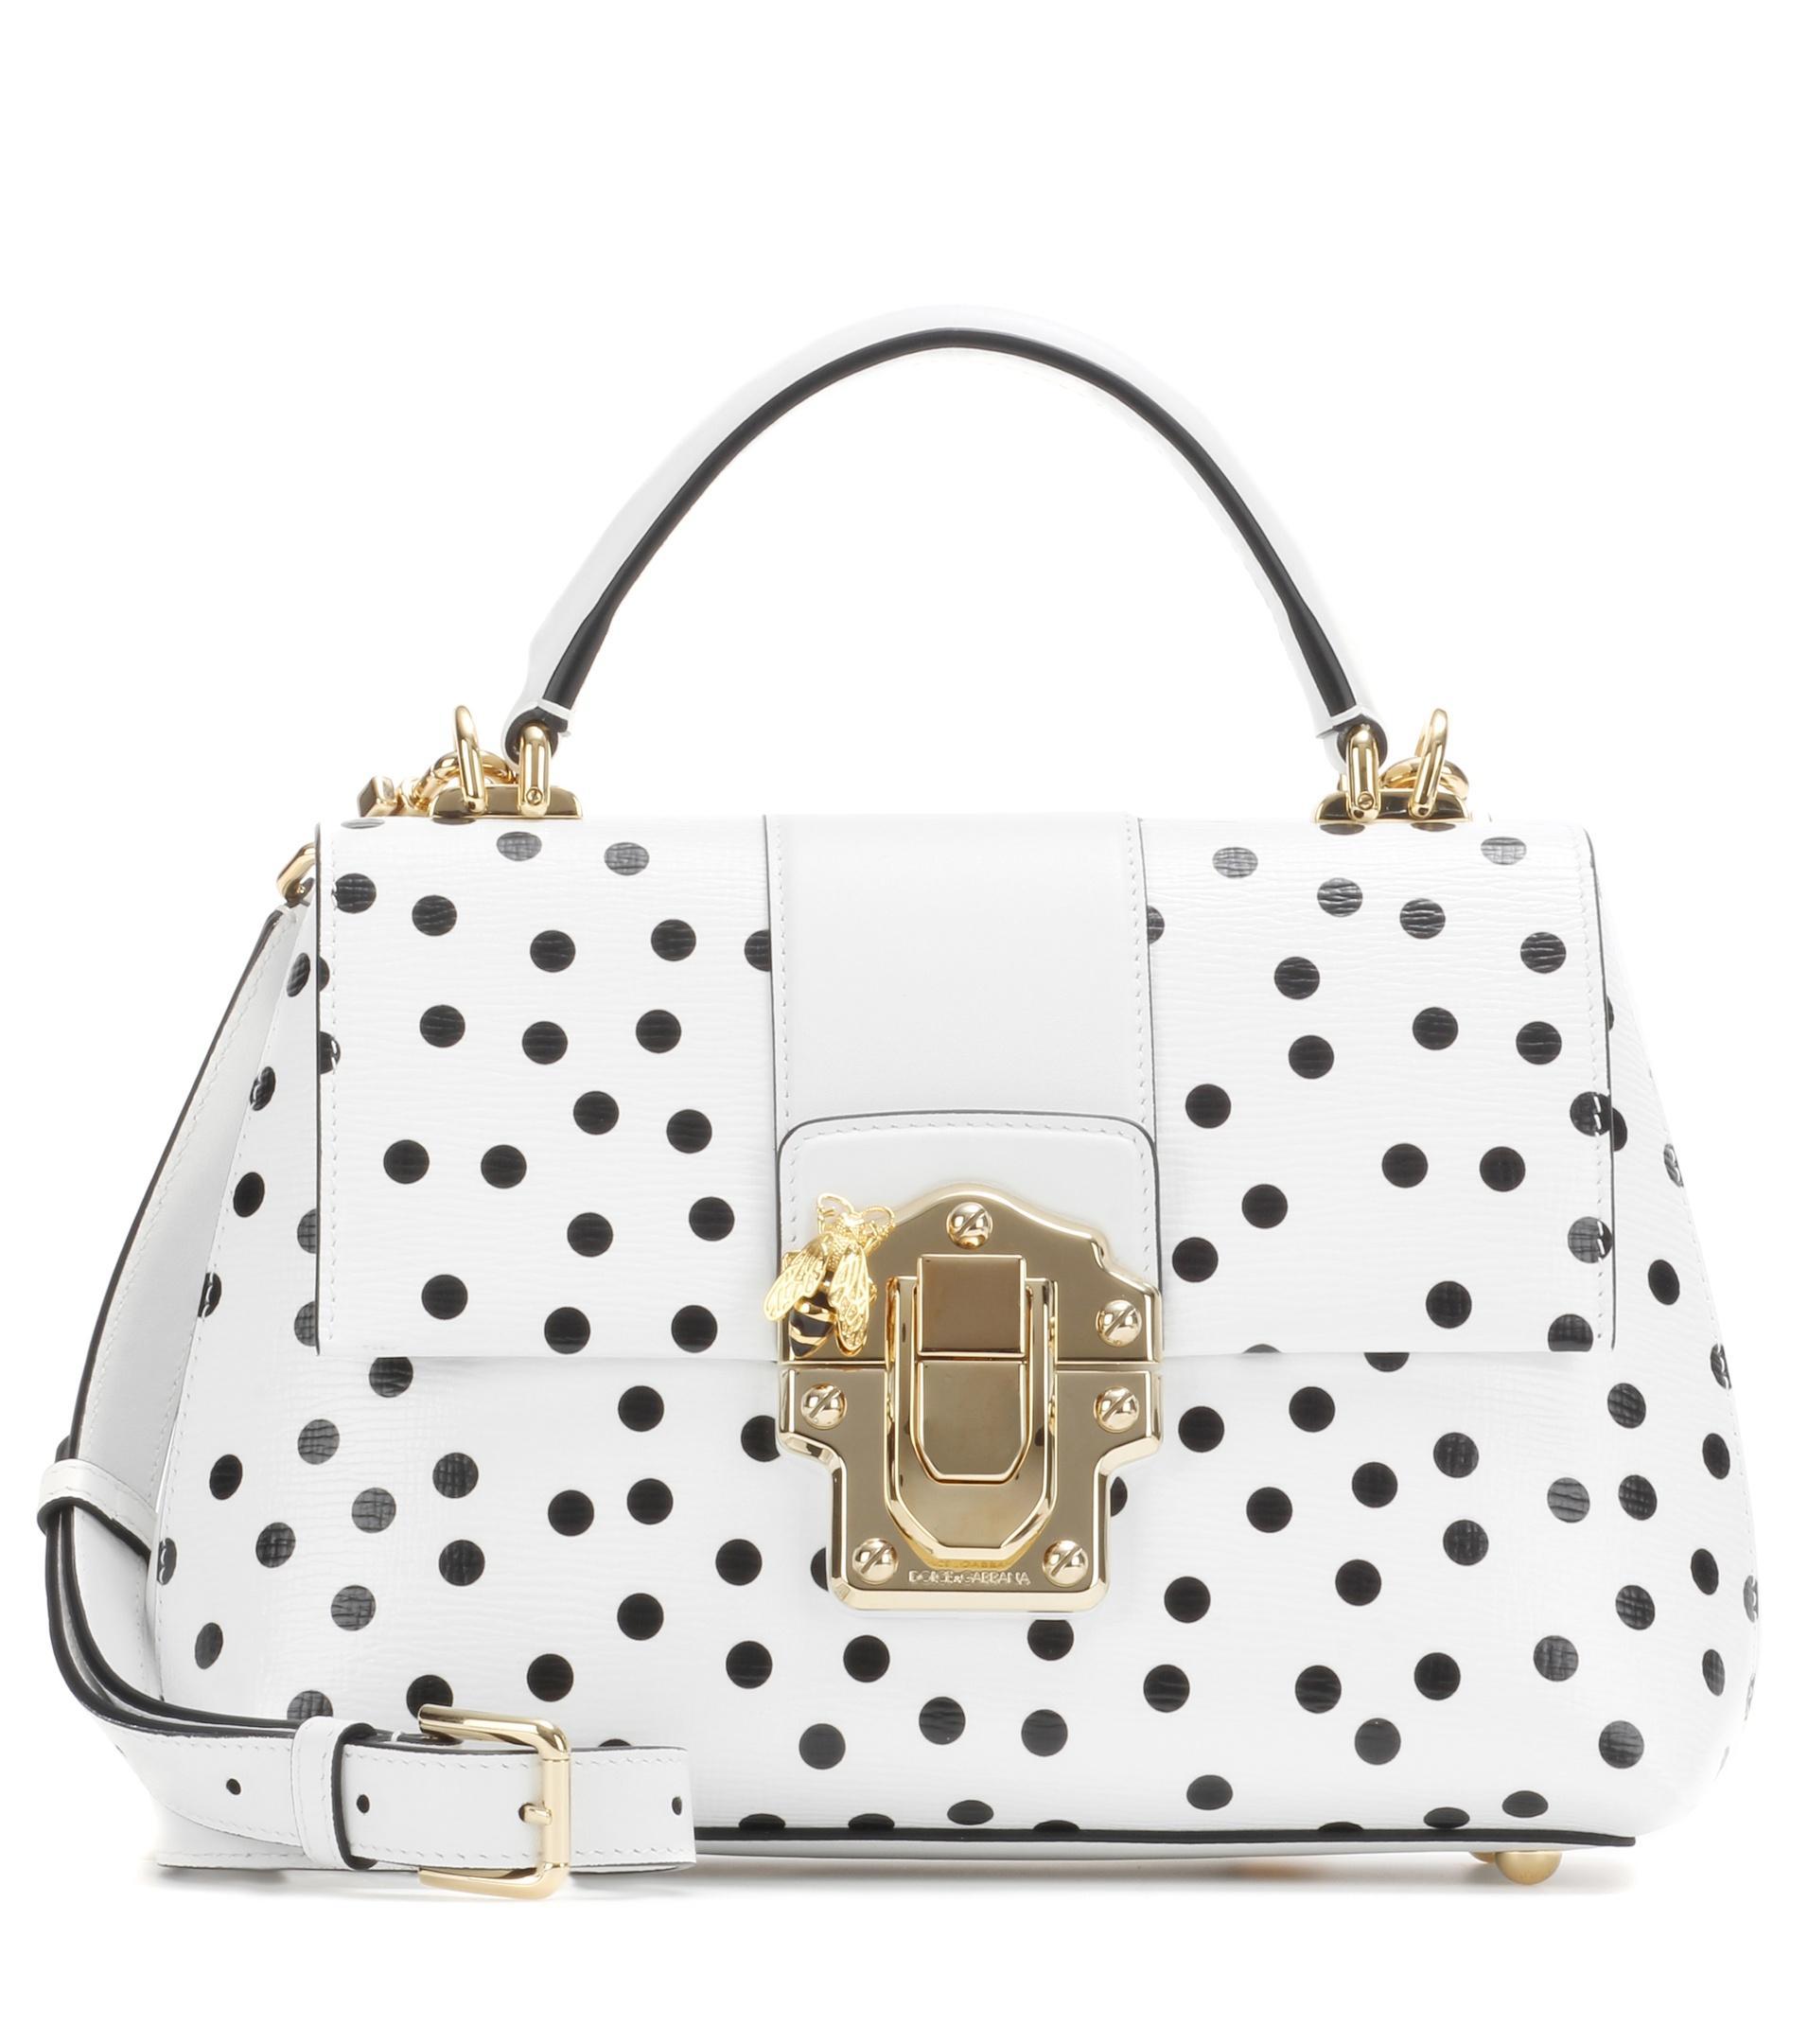 ed0f69570c5 Lyst - Dolce   Gabbana Lucia Polka-dot Textured-leather Shoulder Bag ...